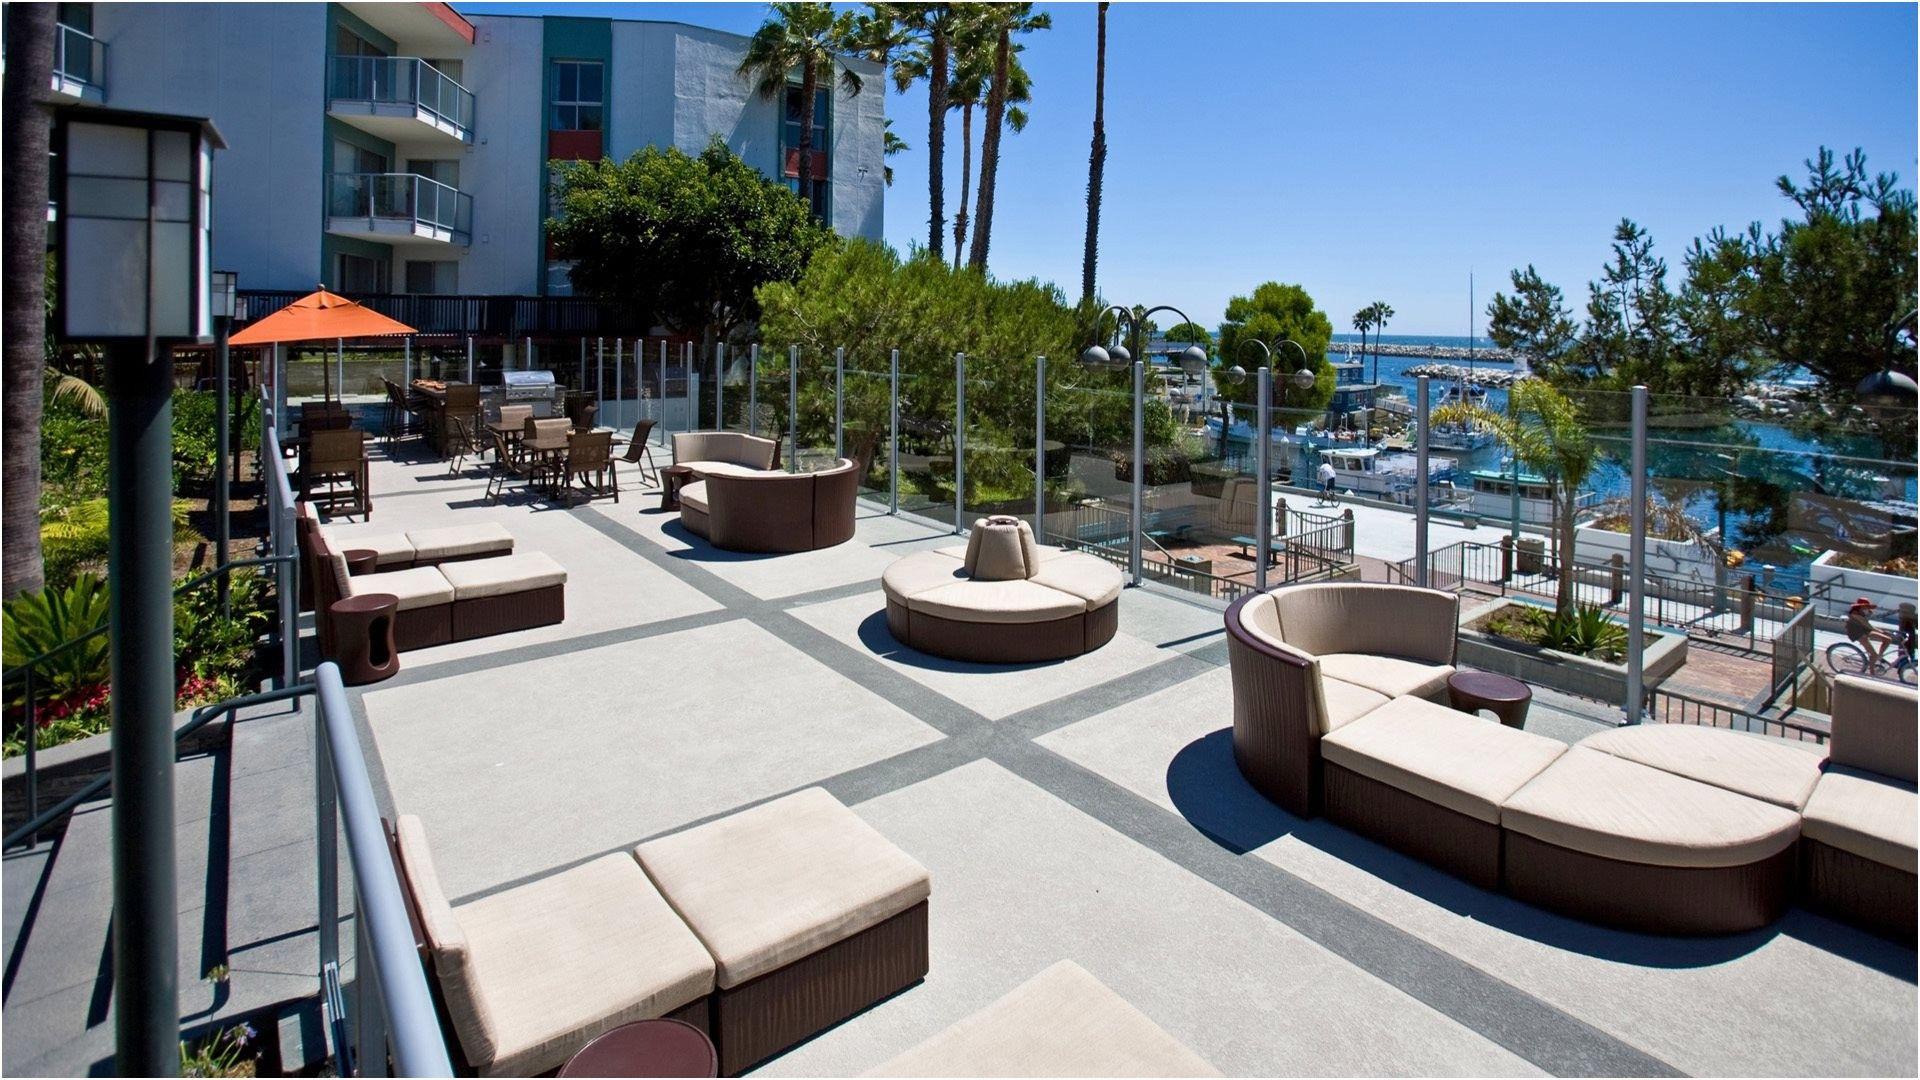 Ocean Club Apartments In Redondo Beach Ca From Redondo Beach Housing